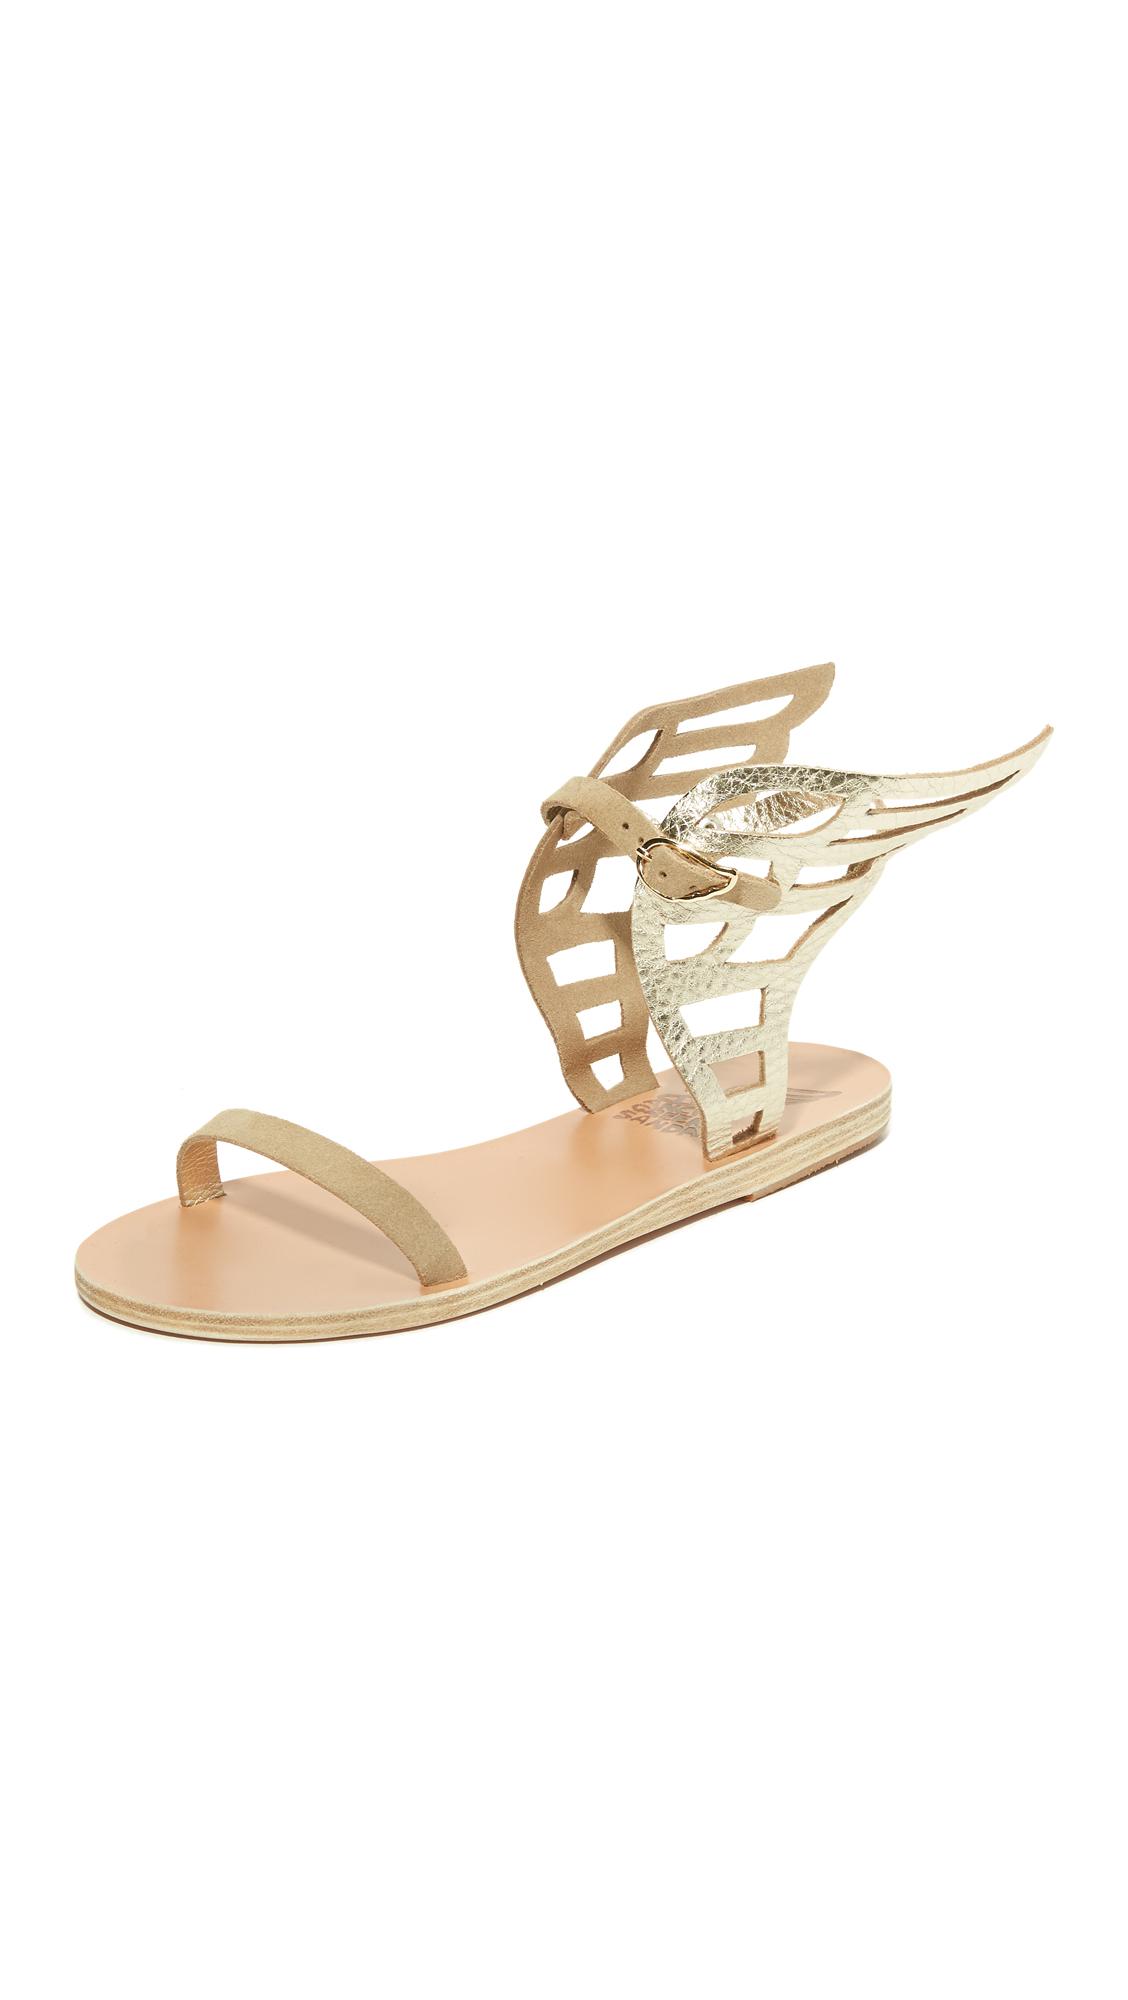 Ancient Greek Sandals Ikaria Lace Sandals - Platinum at Shopbop